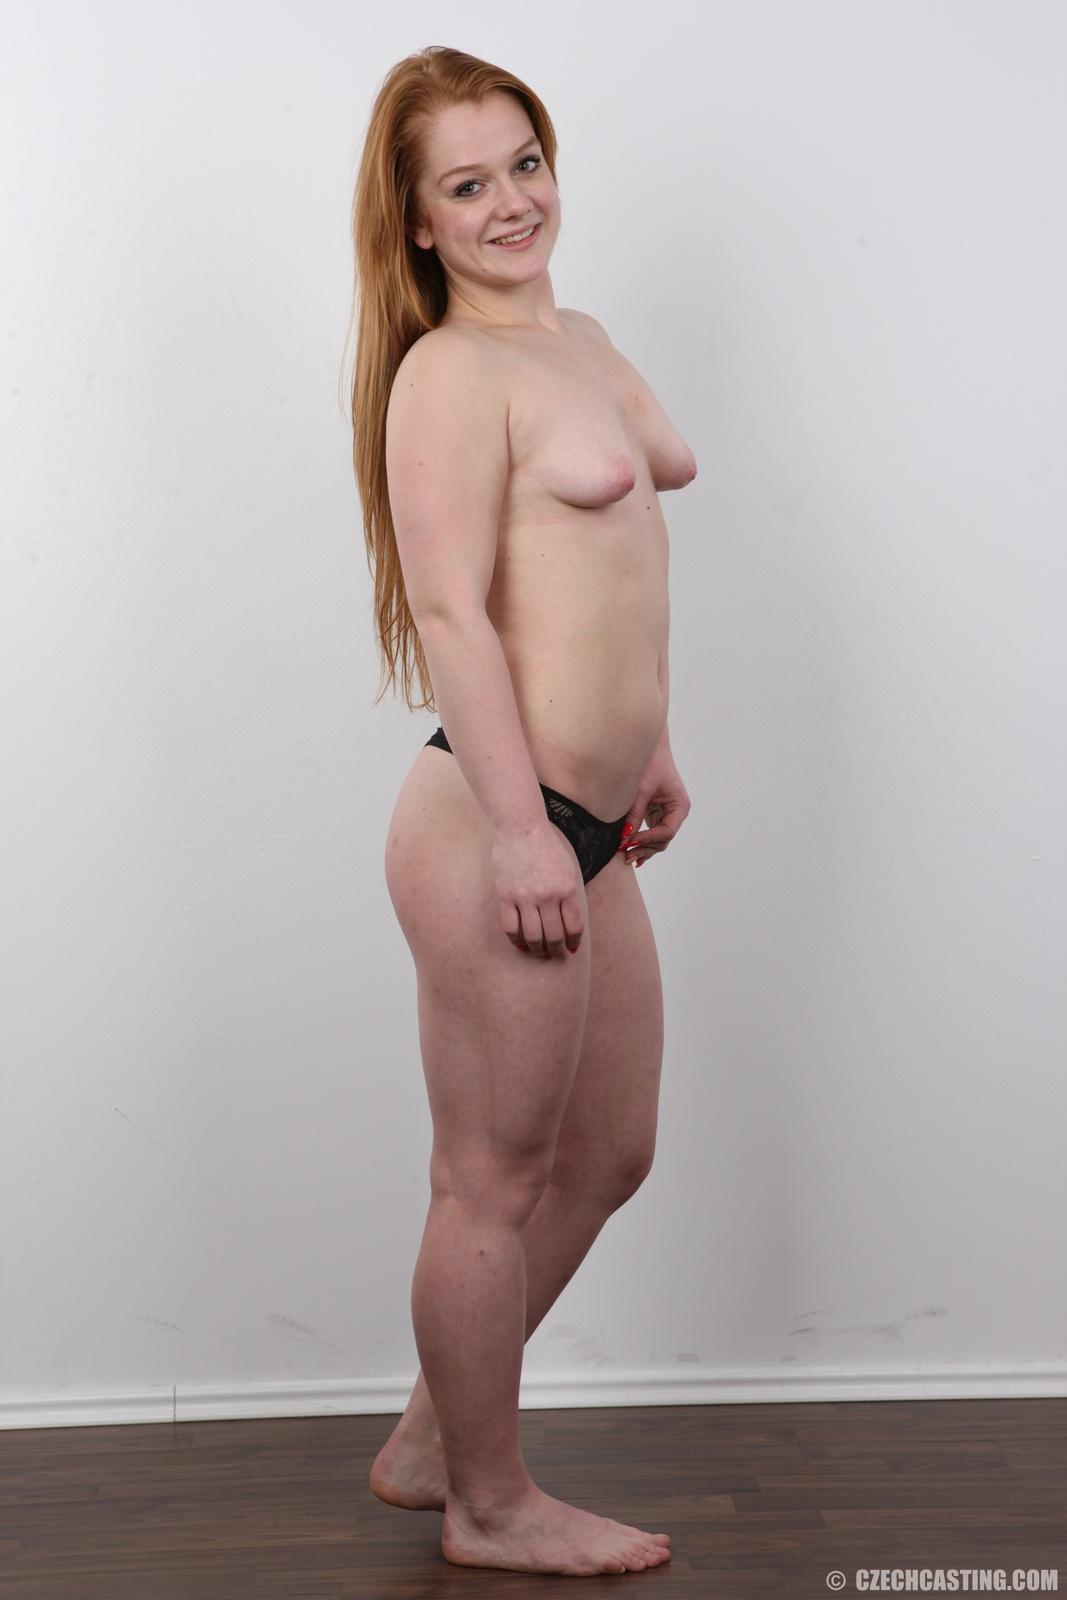 wpid-18-year-old-eliska-casting-photos24.jpg